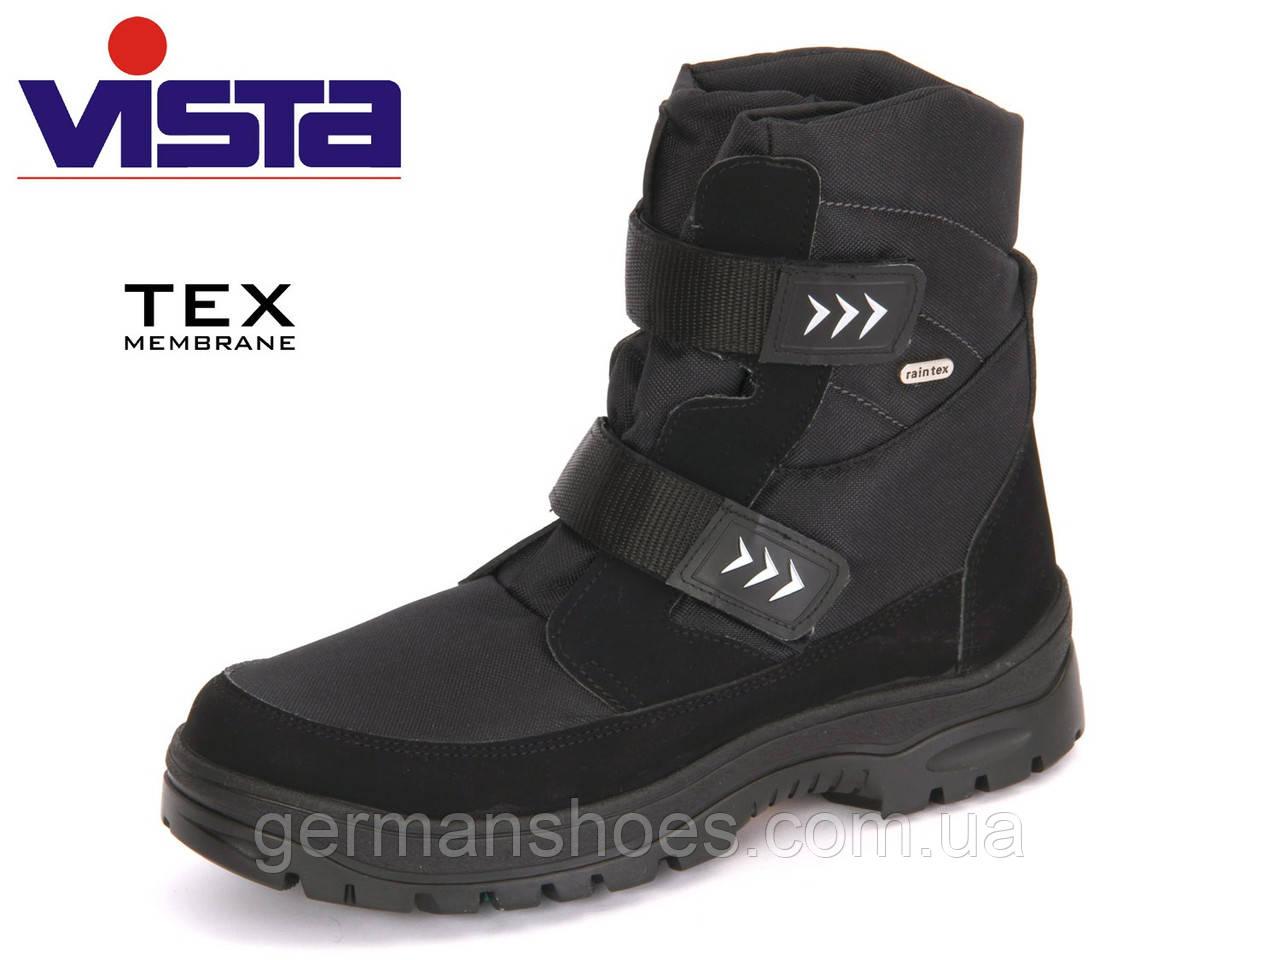 Ботинки мужские Vista 53-53610